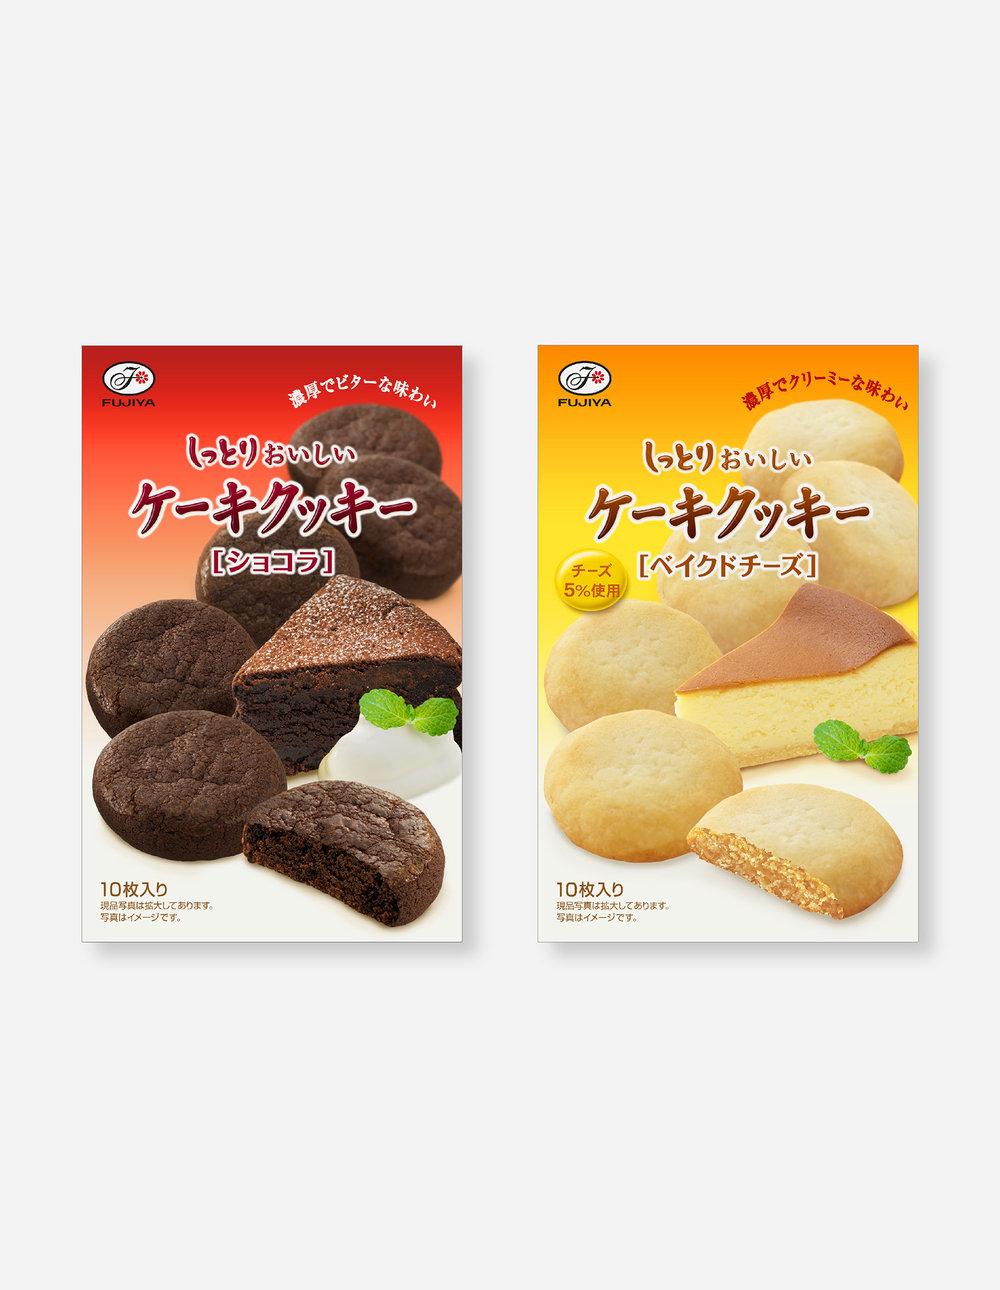 Cake Cookies (2010)Fujiya Food Service Co., Ltd.